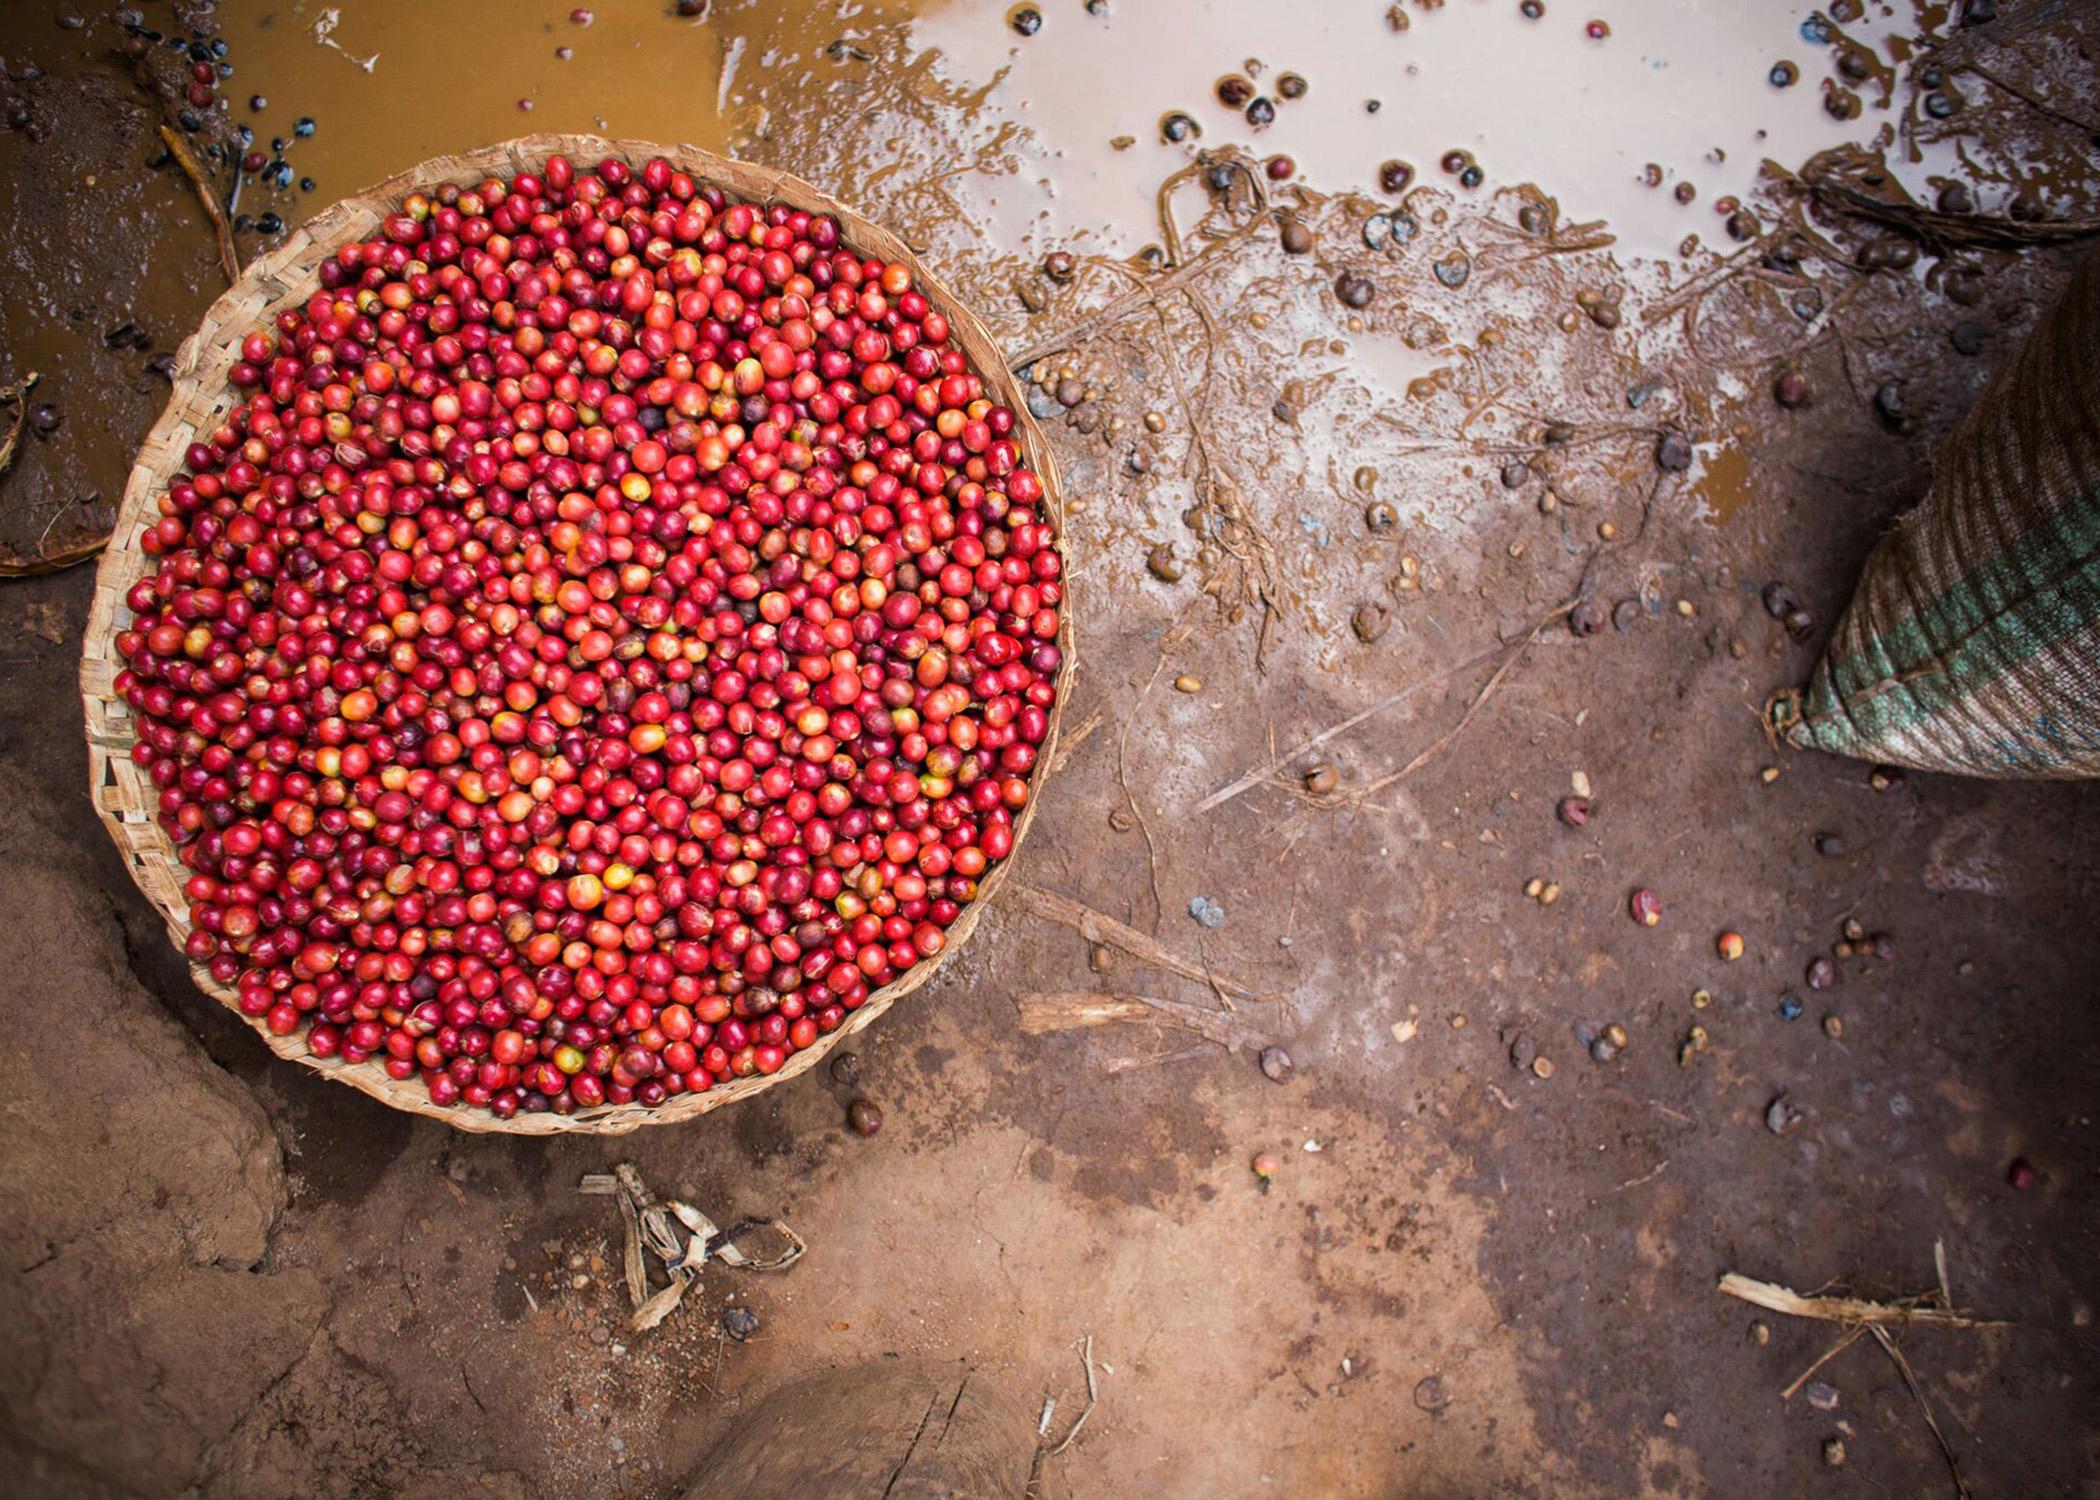 http://redstrandcoffee.com/wp-content/uploads/2019/11/Mutana-2-1.jpeg